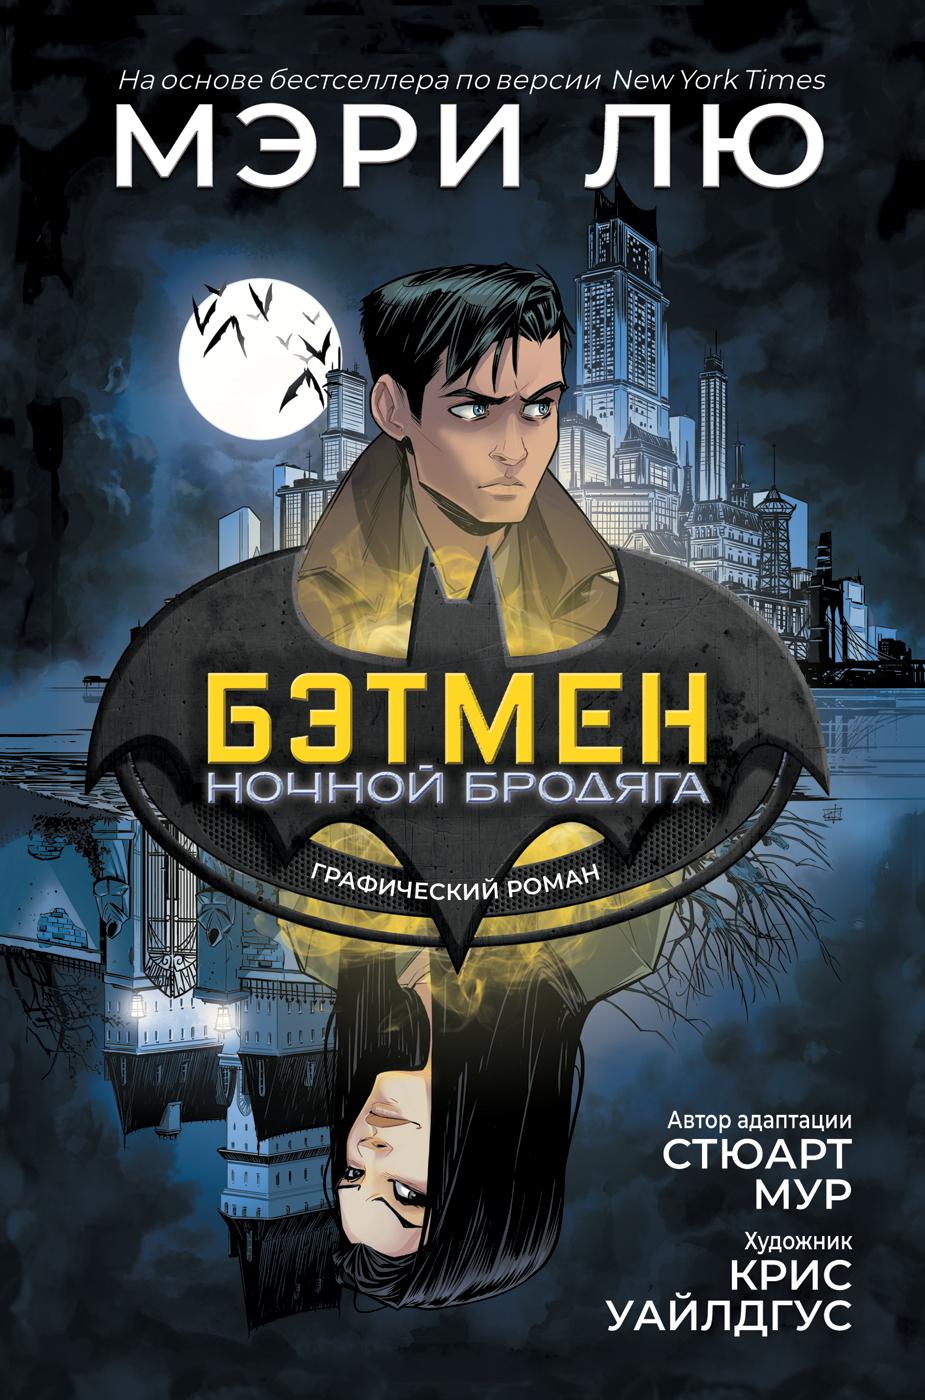 Мэри Лю, Стюарт Мур, Крис Уайлдгус Комикс Бэтмен: Ночной бродяга лю мэри бэтмен ночной бродяга